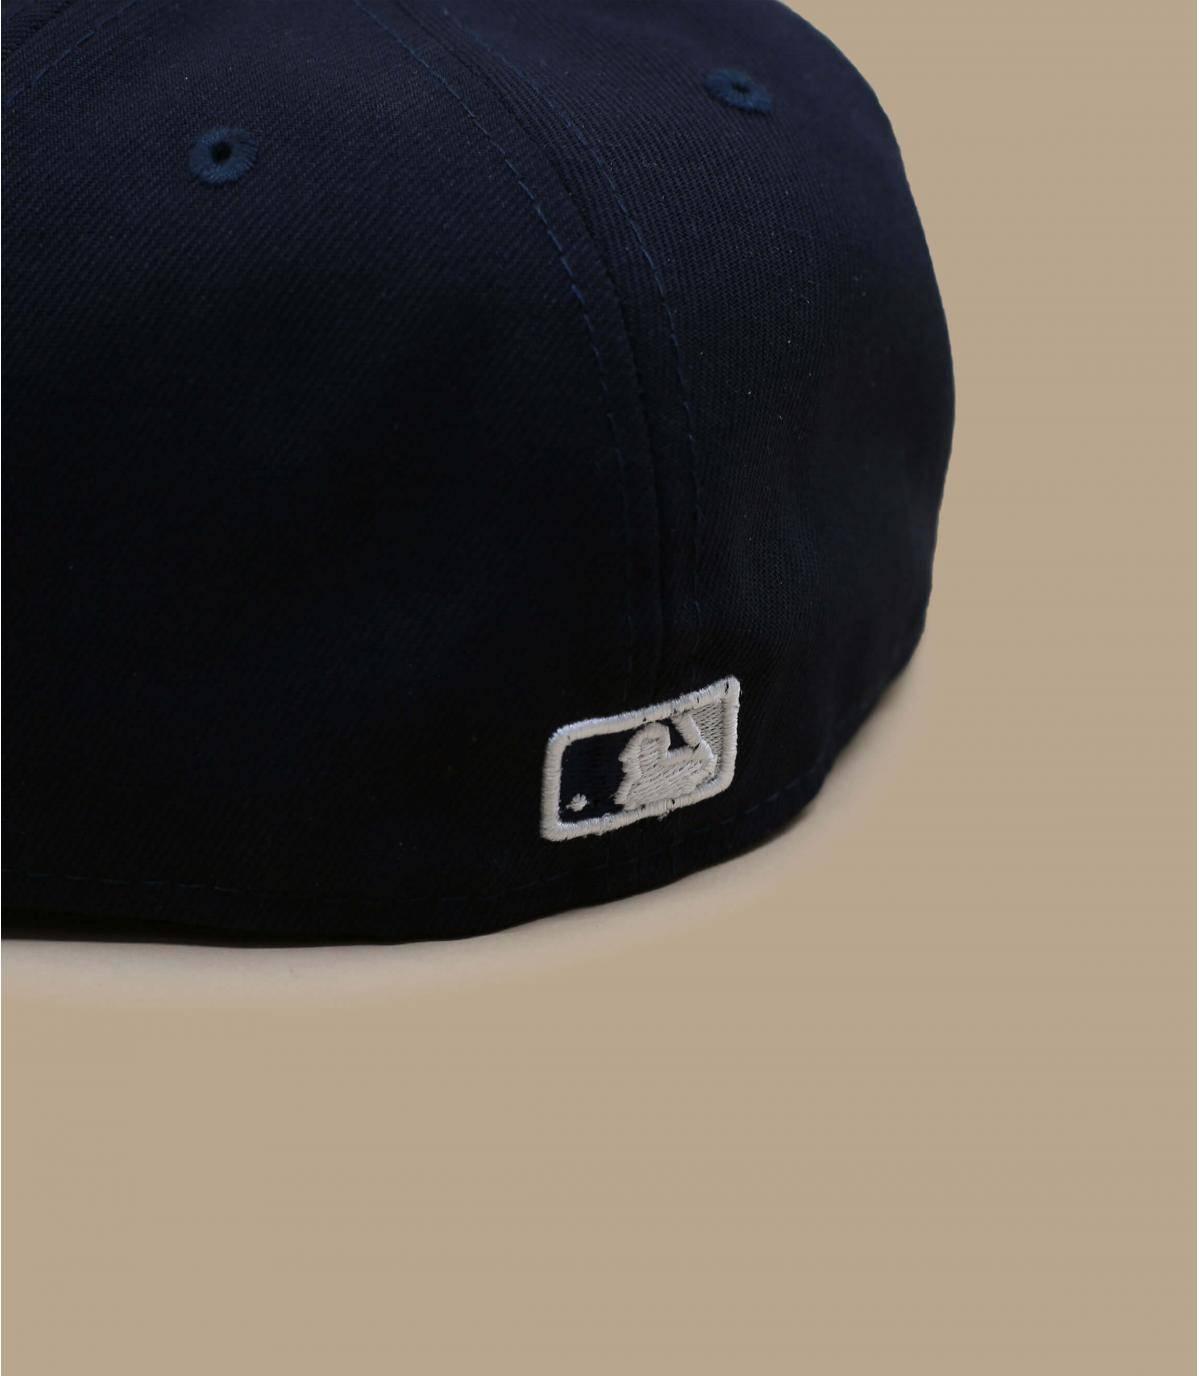 Dettagli MLB AC Perf 5950 New York Yankees - image 3